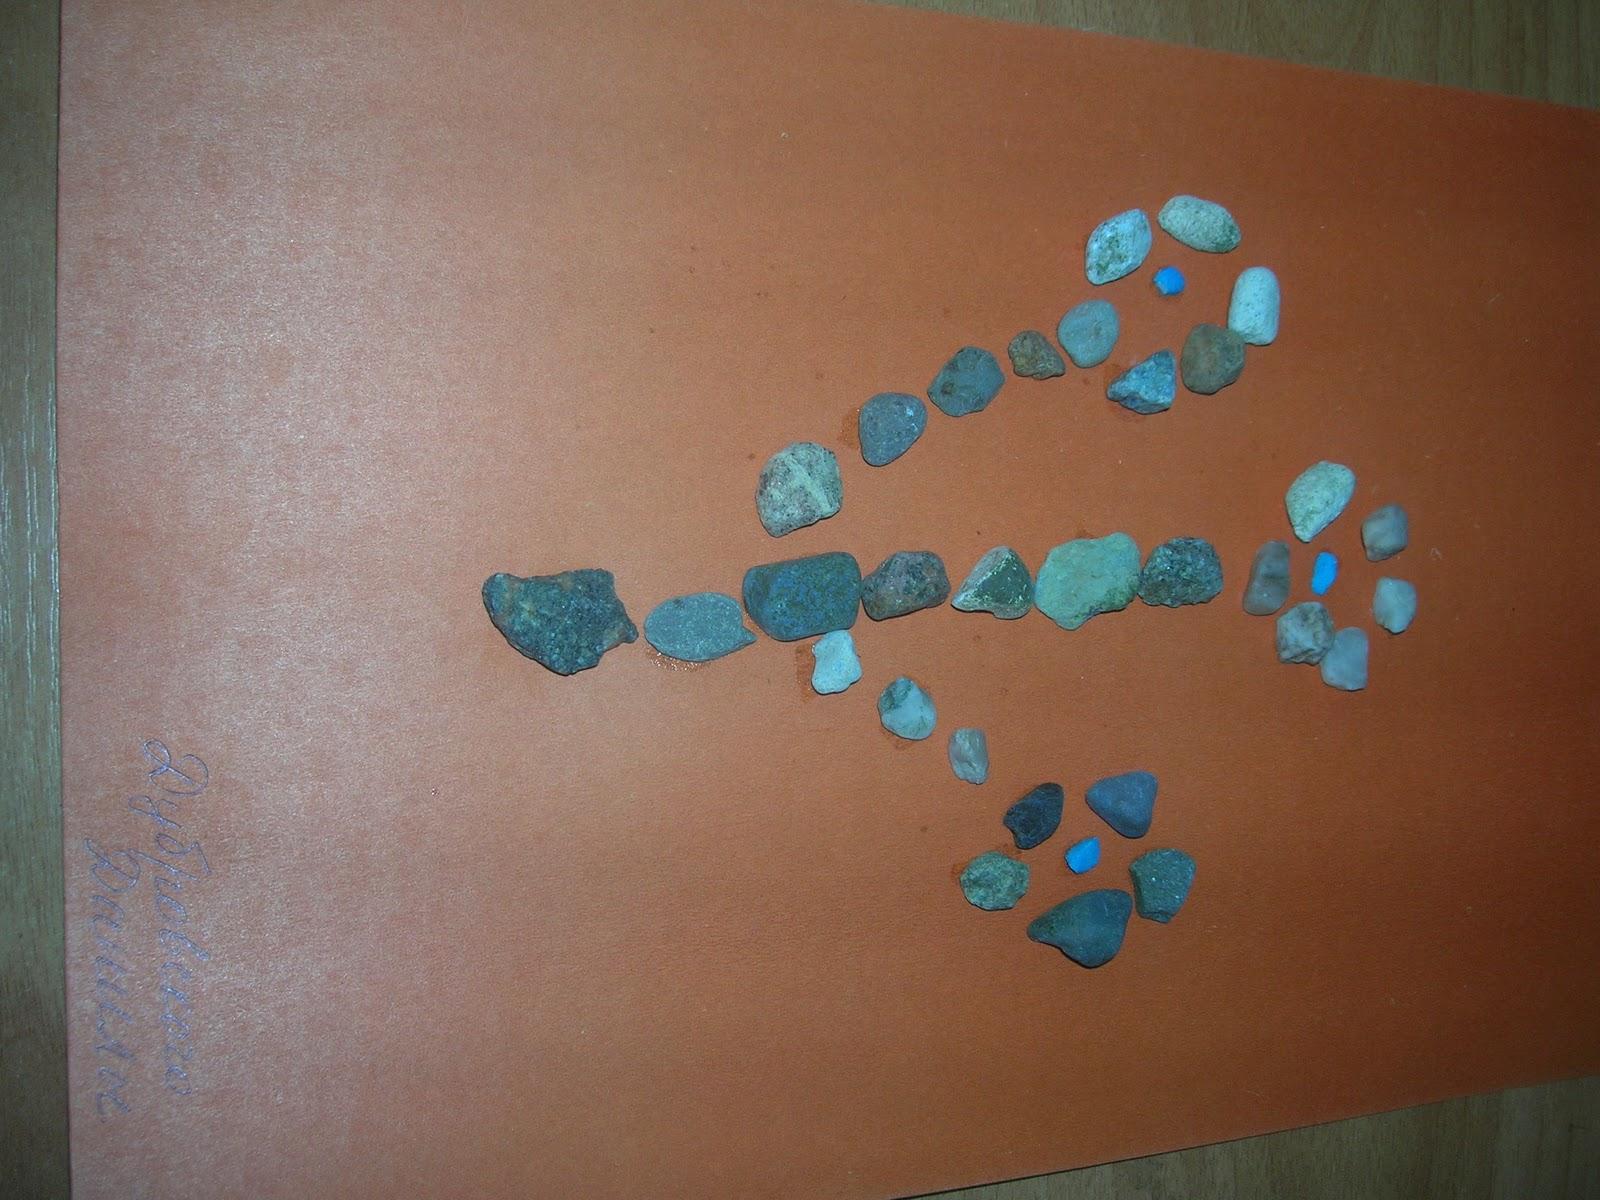 Фигурки из камней своими руками на бумаге фото 32